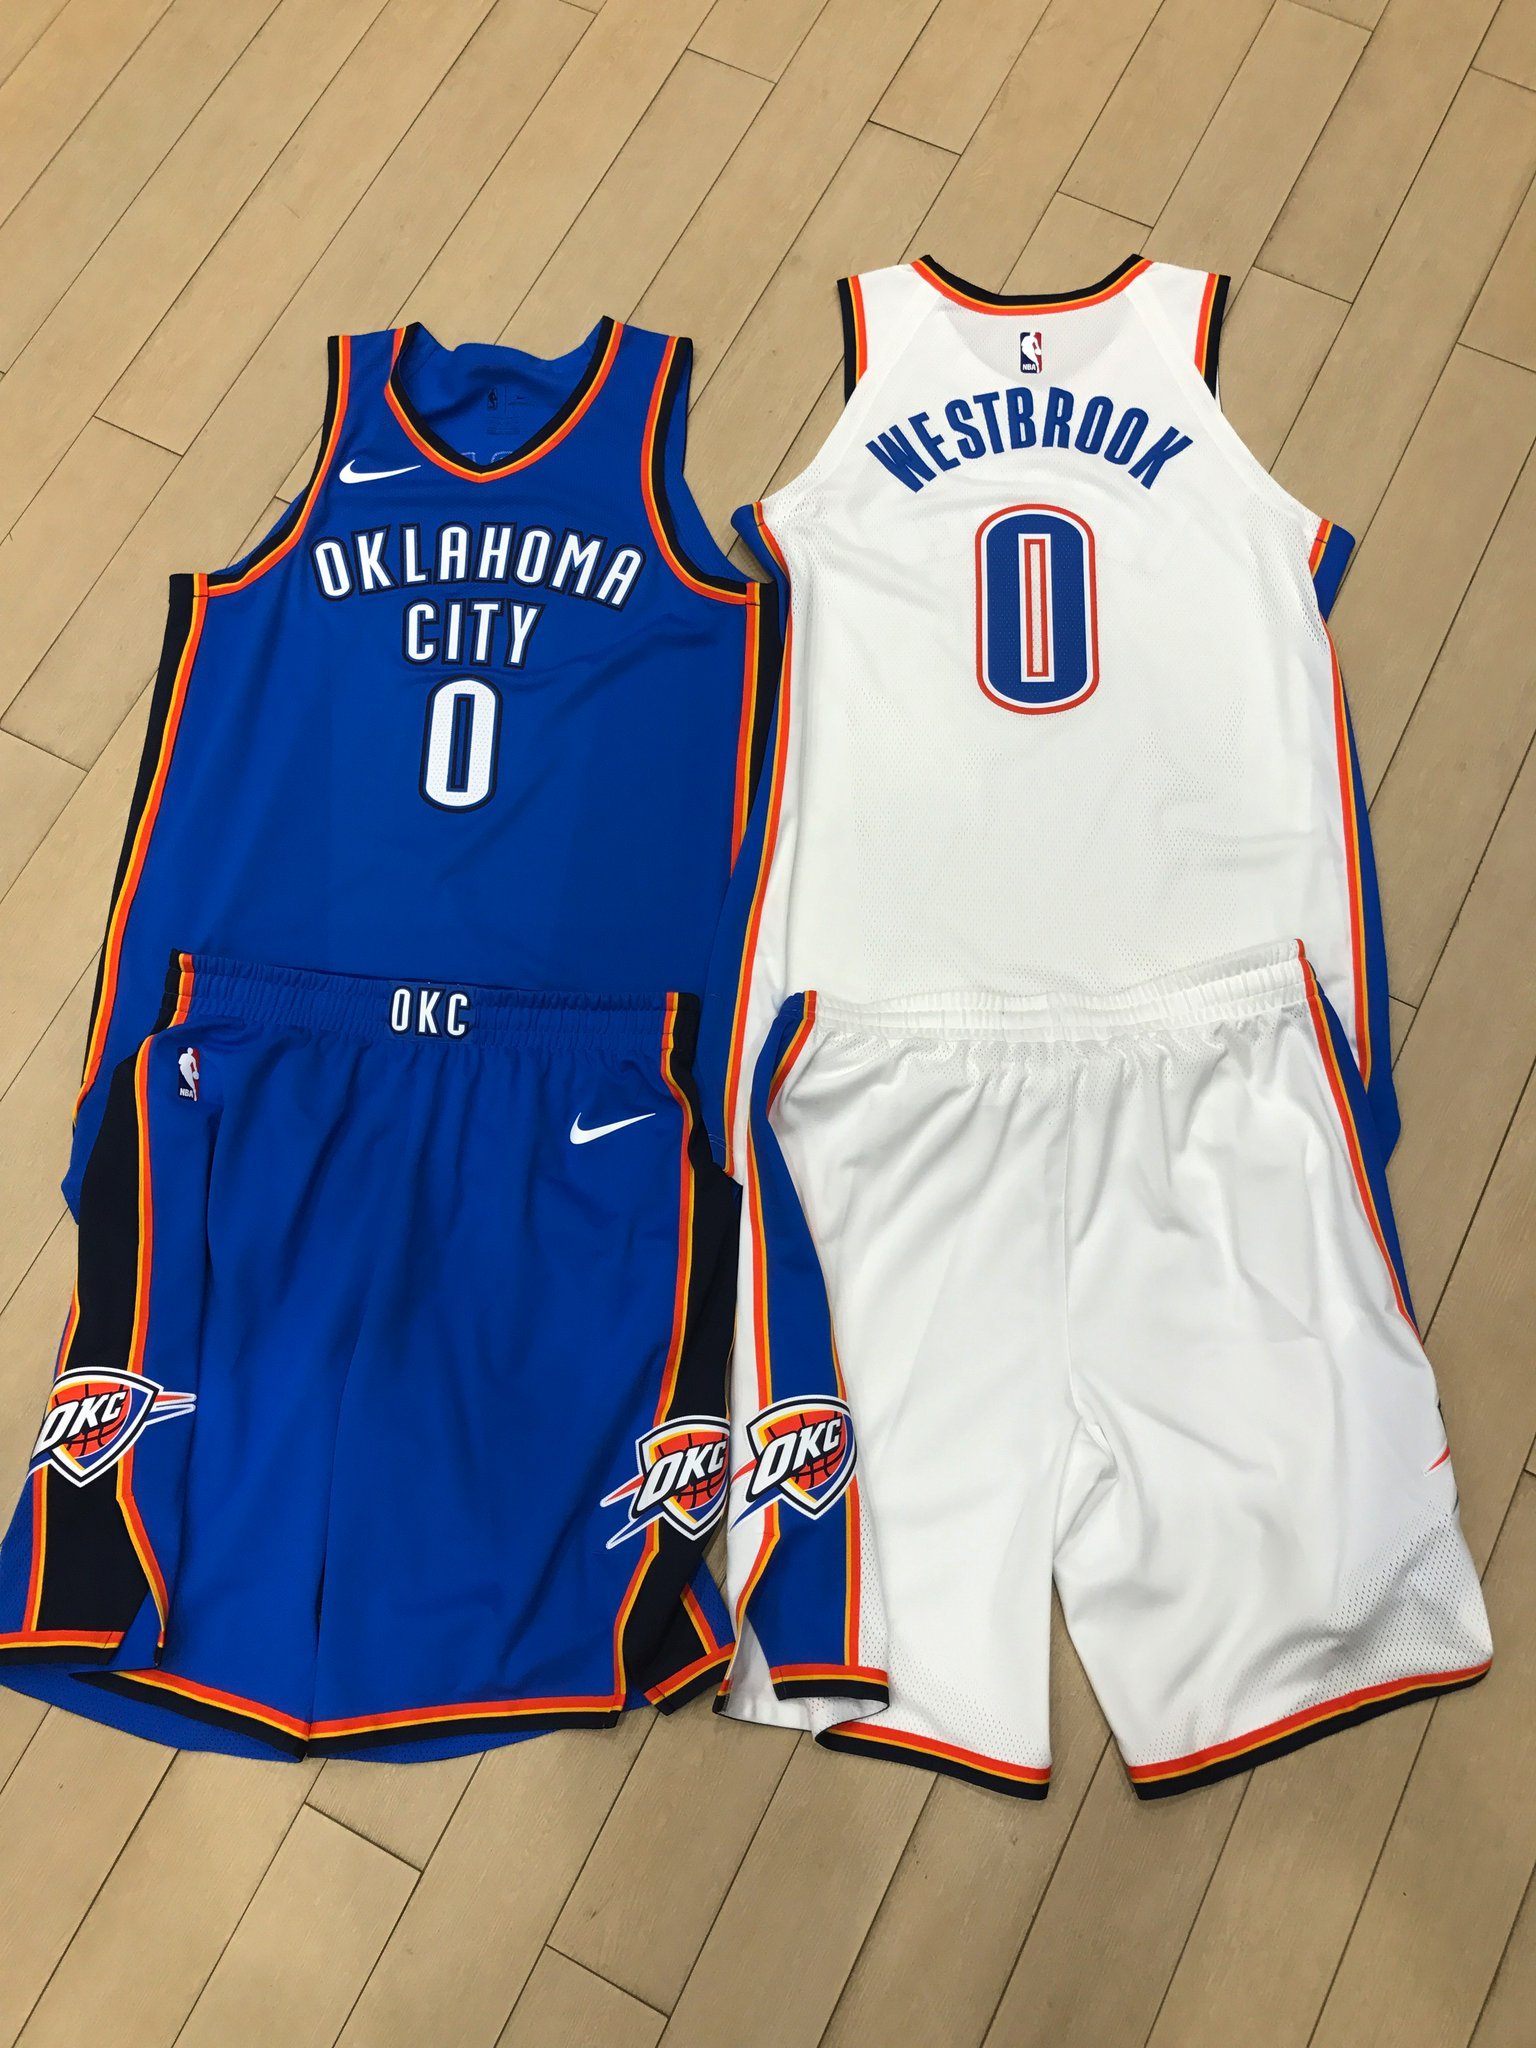 Here are all of Nike's new NBA jerseys - SBNation.com